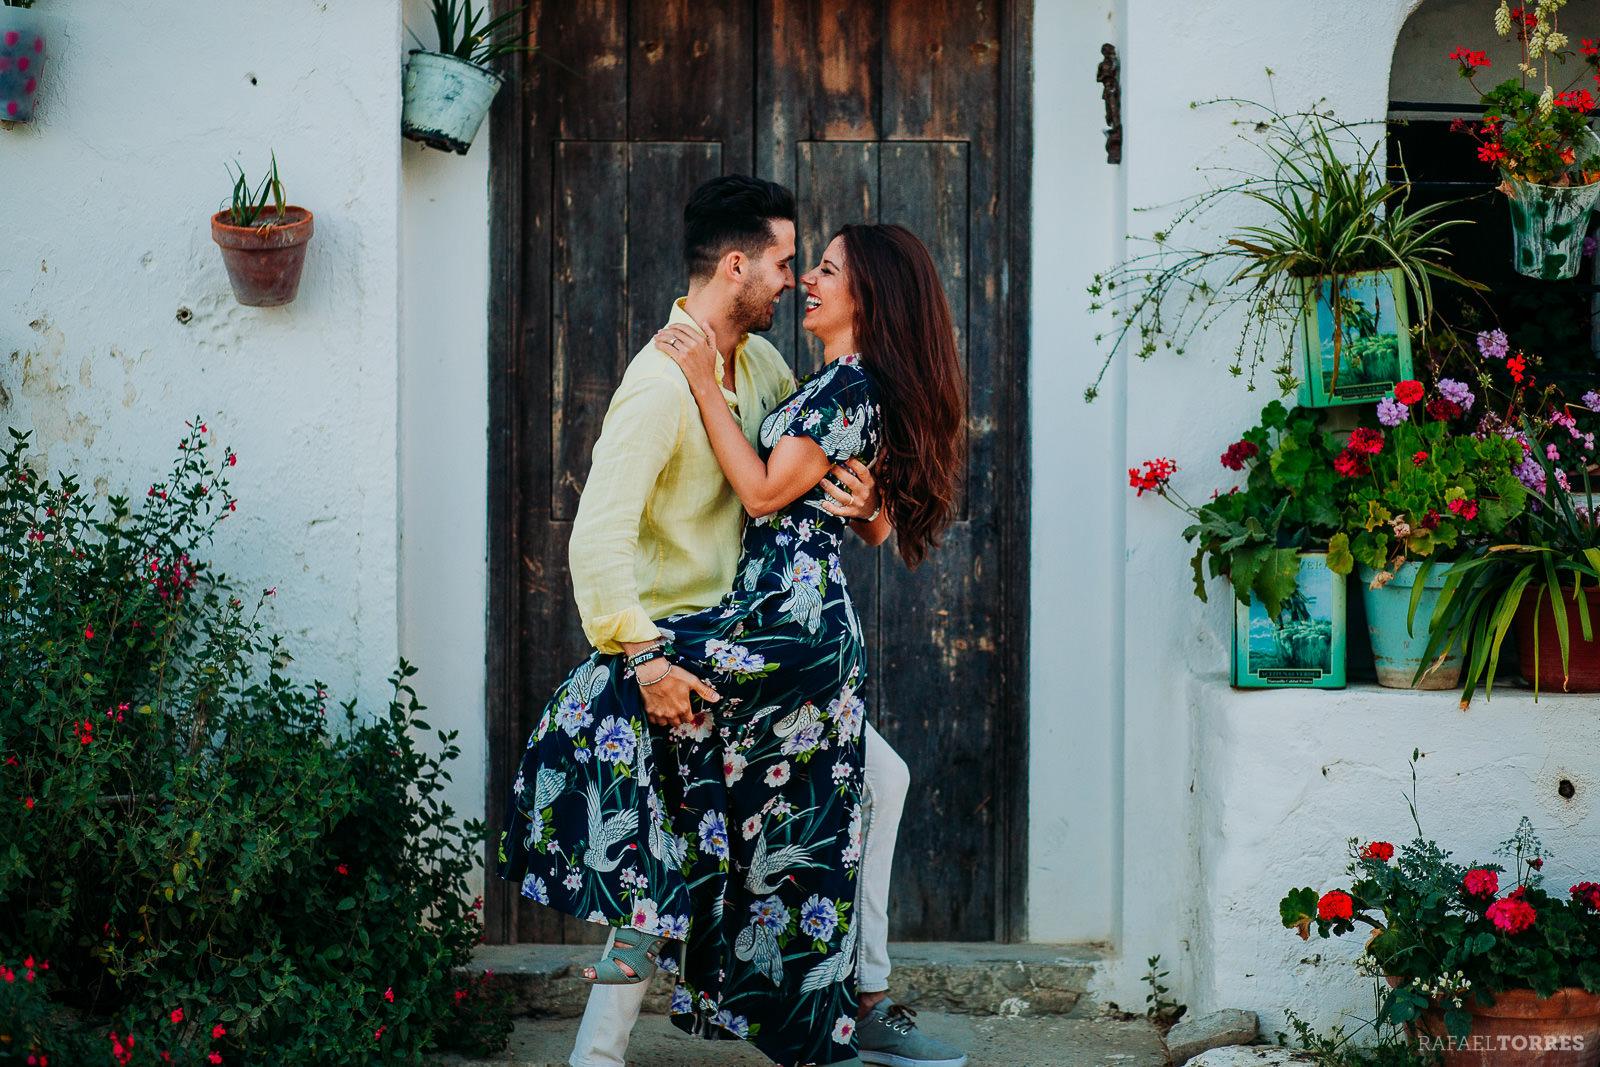 fotografo-preboda-vejer-frontera-cadiz-conil-meca-wedding-photography-rafael-torres-natural-photo-23.jpg